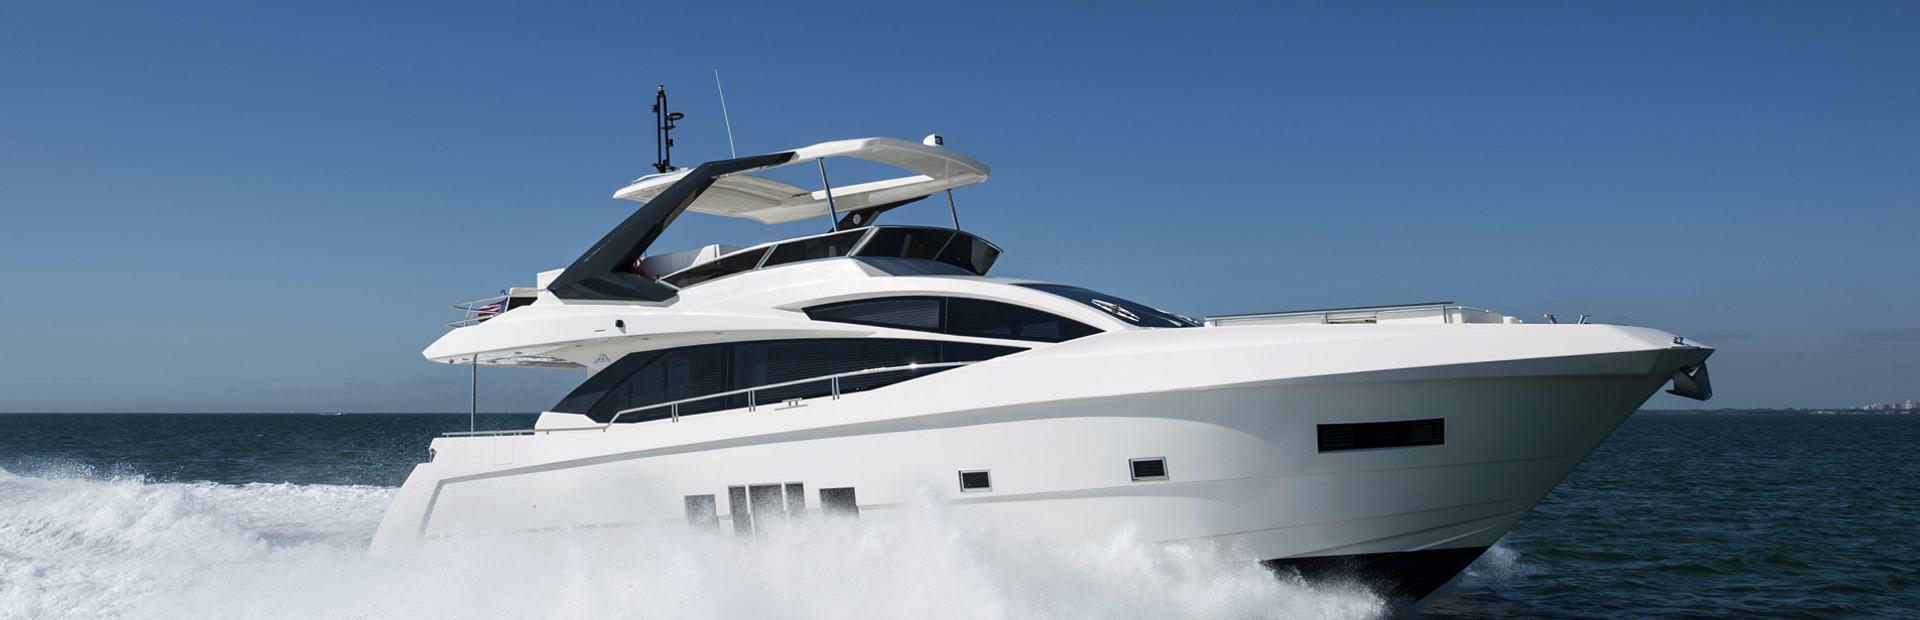 72 Flybridge Yacht Charter